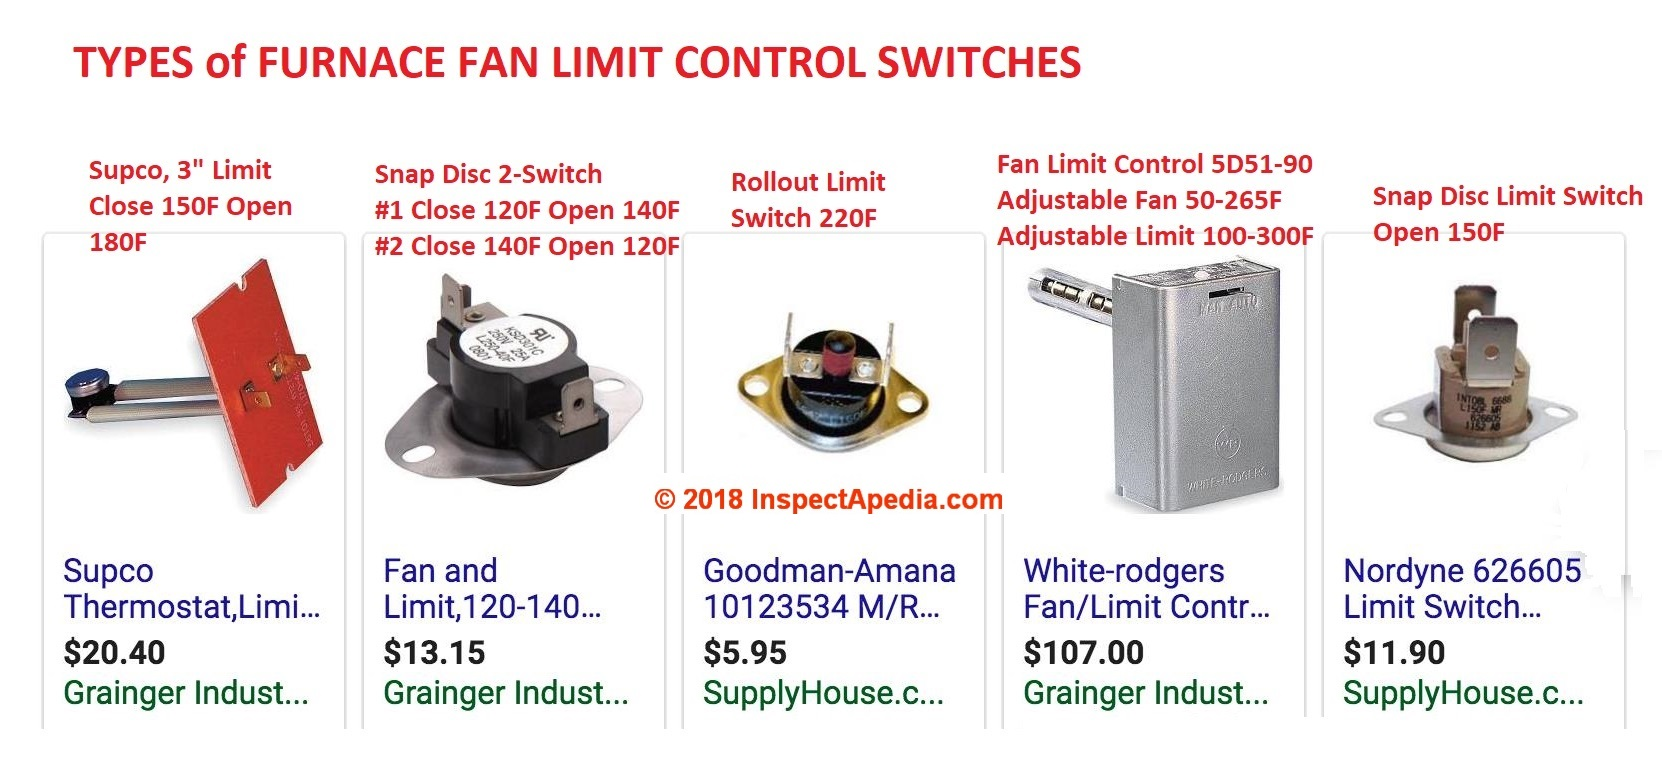 Limit Switch Open Furnace Facias Automatic Ac Transfer Ecorenovator